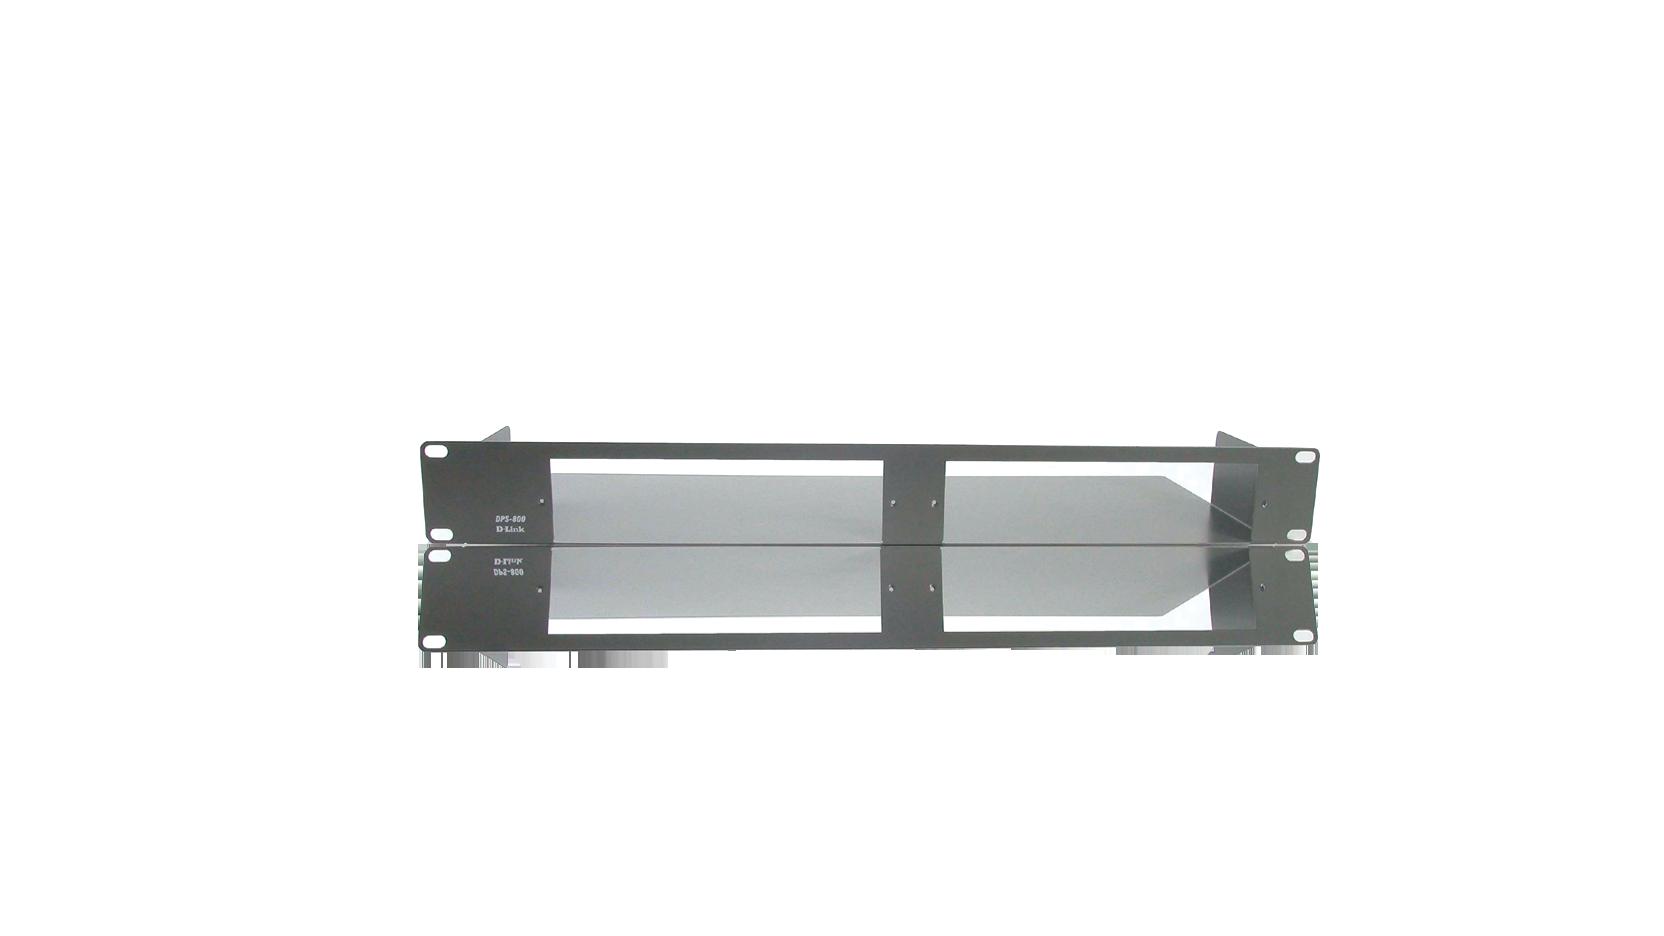 DPS-800 2 Slot Rack-mount Chassis for select D-Link DPS Redundant Power  Supplies | D-Link UK